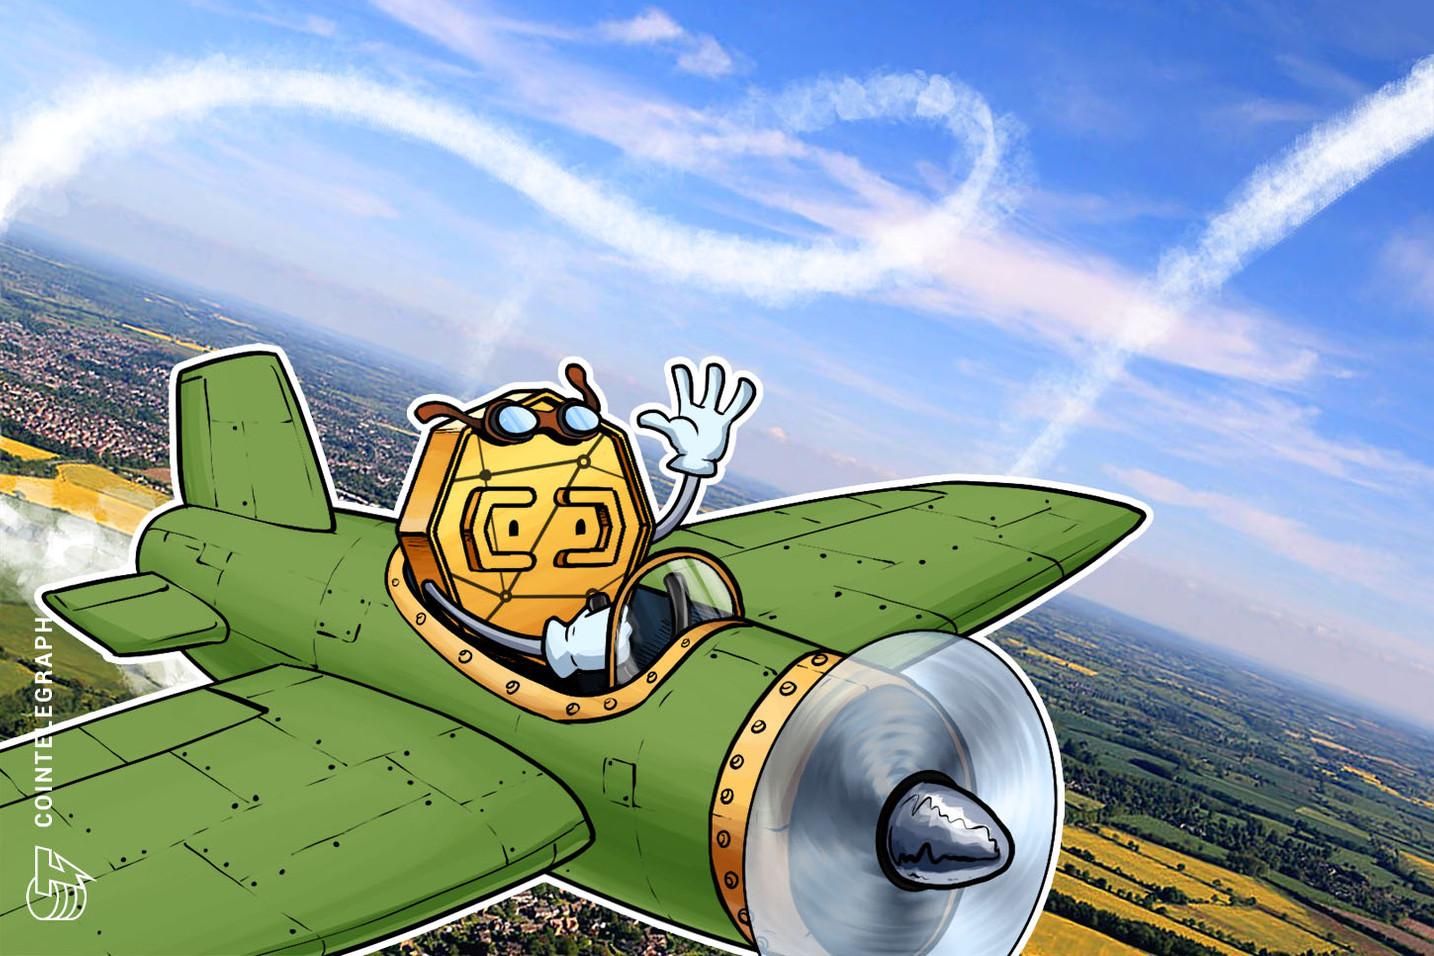 Bitcoin knackt 3.600 US-Dollar, Top-Kryptos legen wieder zu